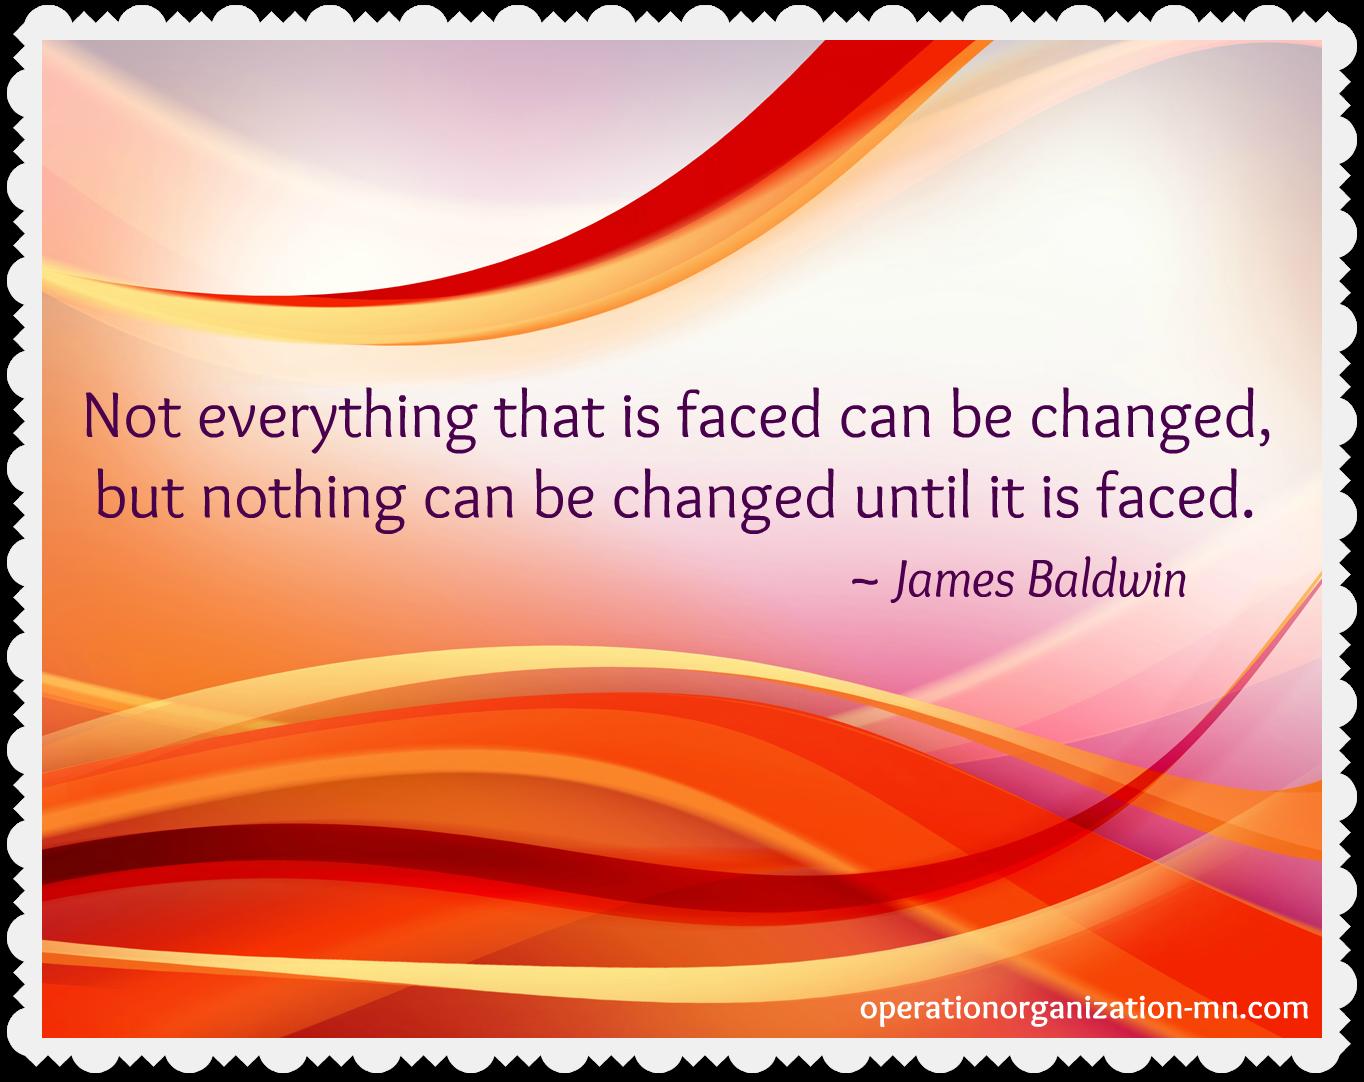 Organizational Change Images Organizational Quotes Change